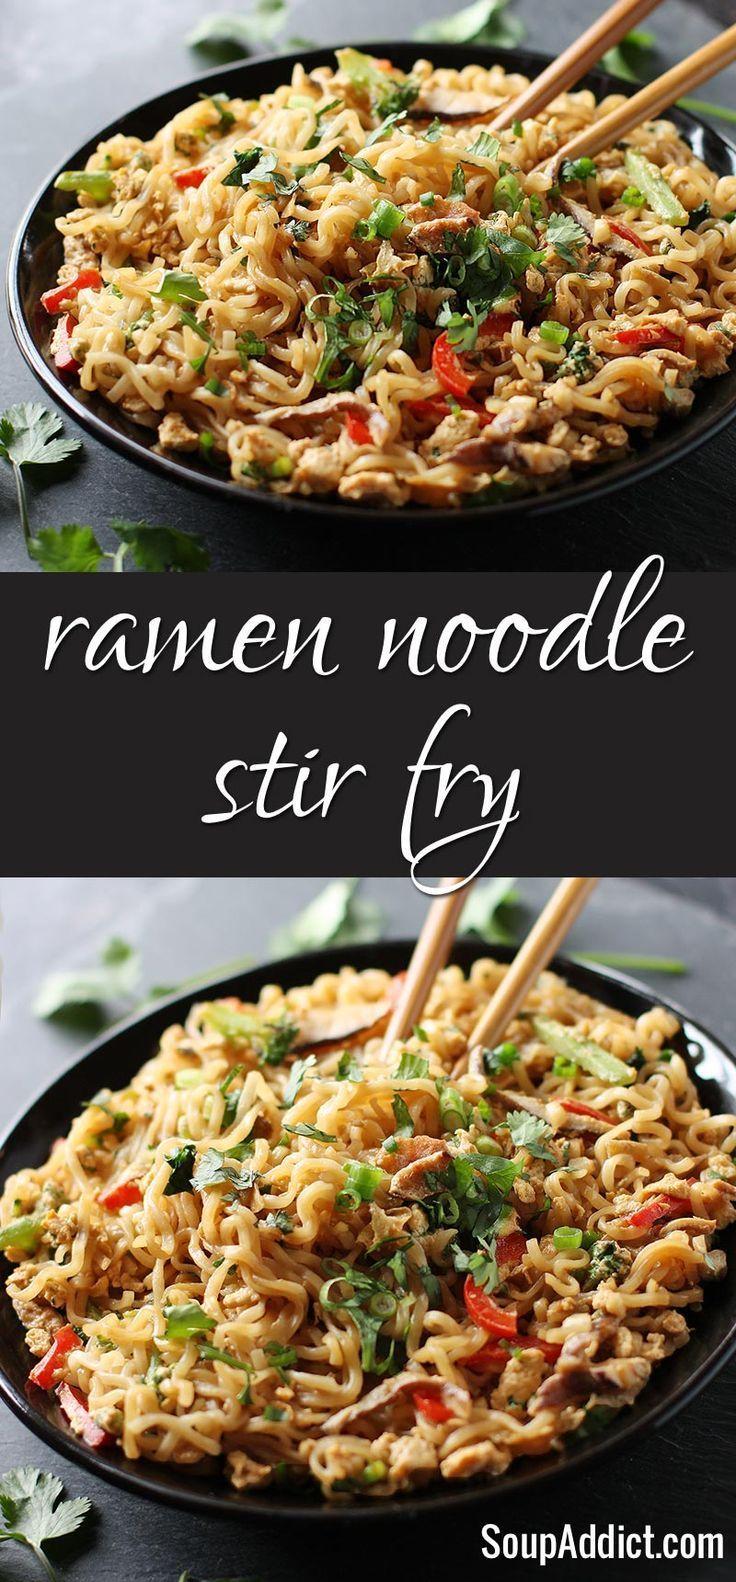 Ramen Noodle Stir Fry - veggies plus quick-cooking ramen noodles makes a tasty, healthy meal. Get the recipe at SoupAddict.com.